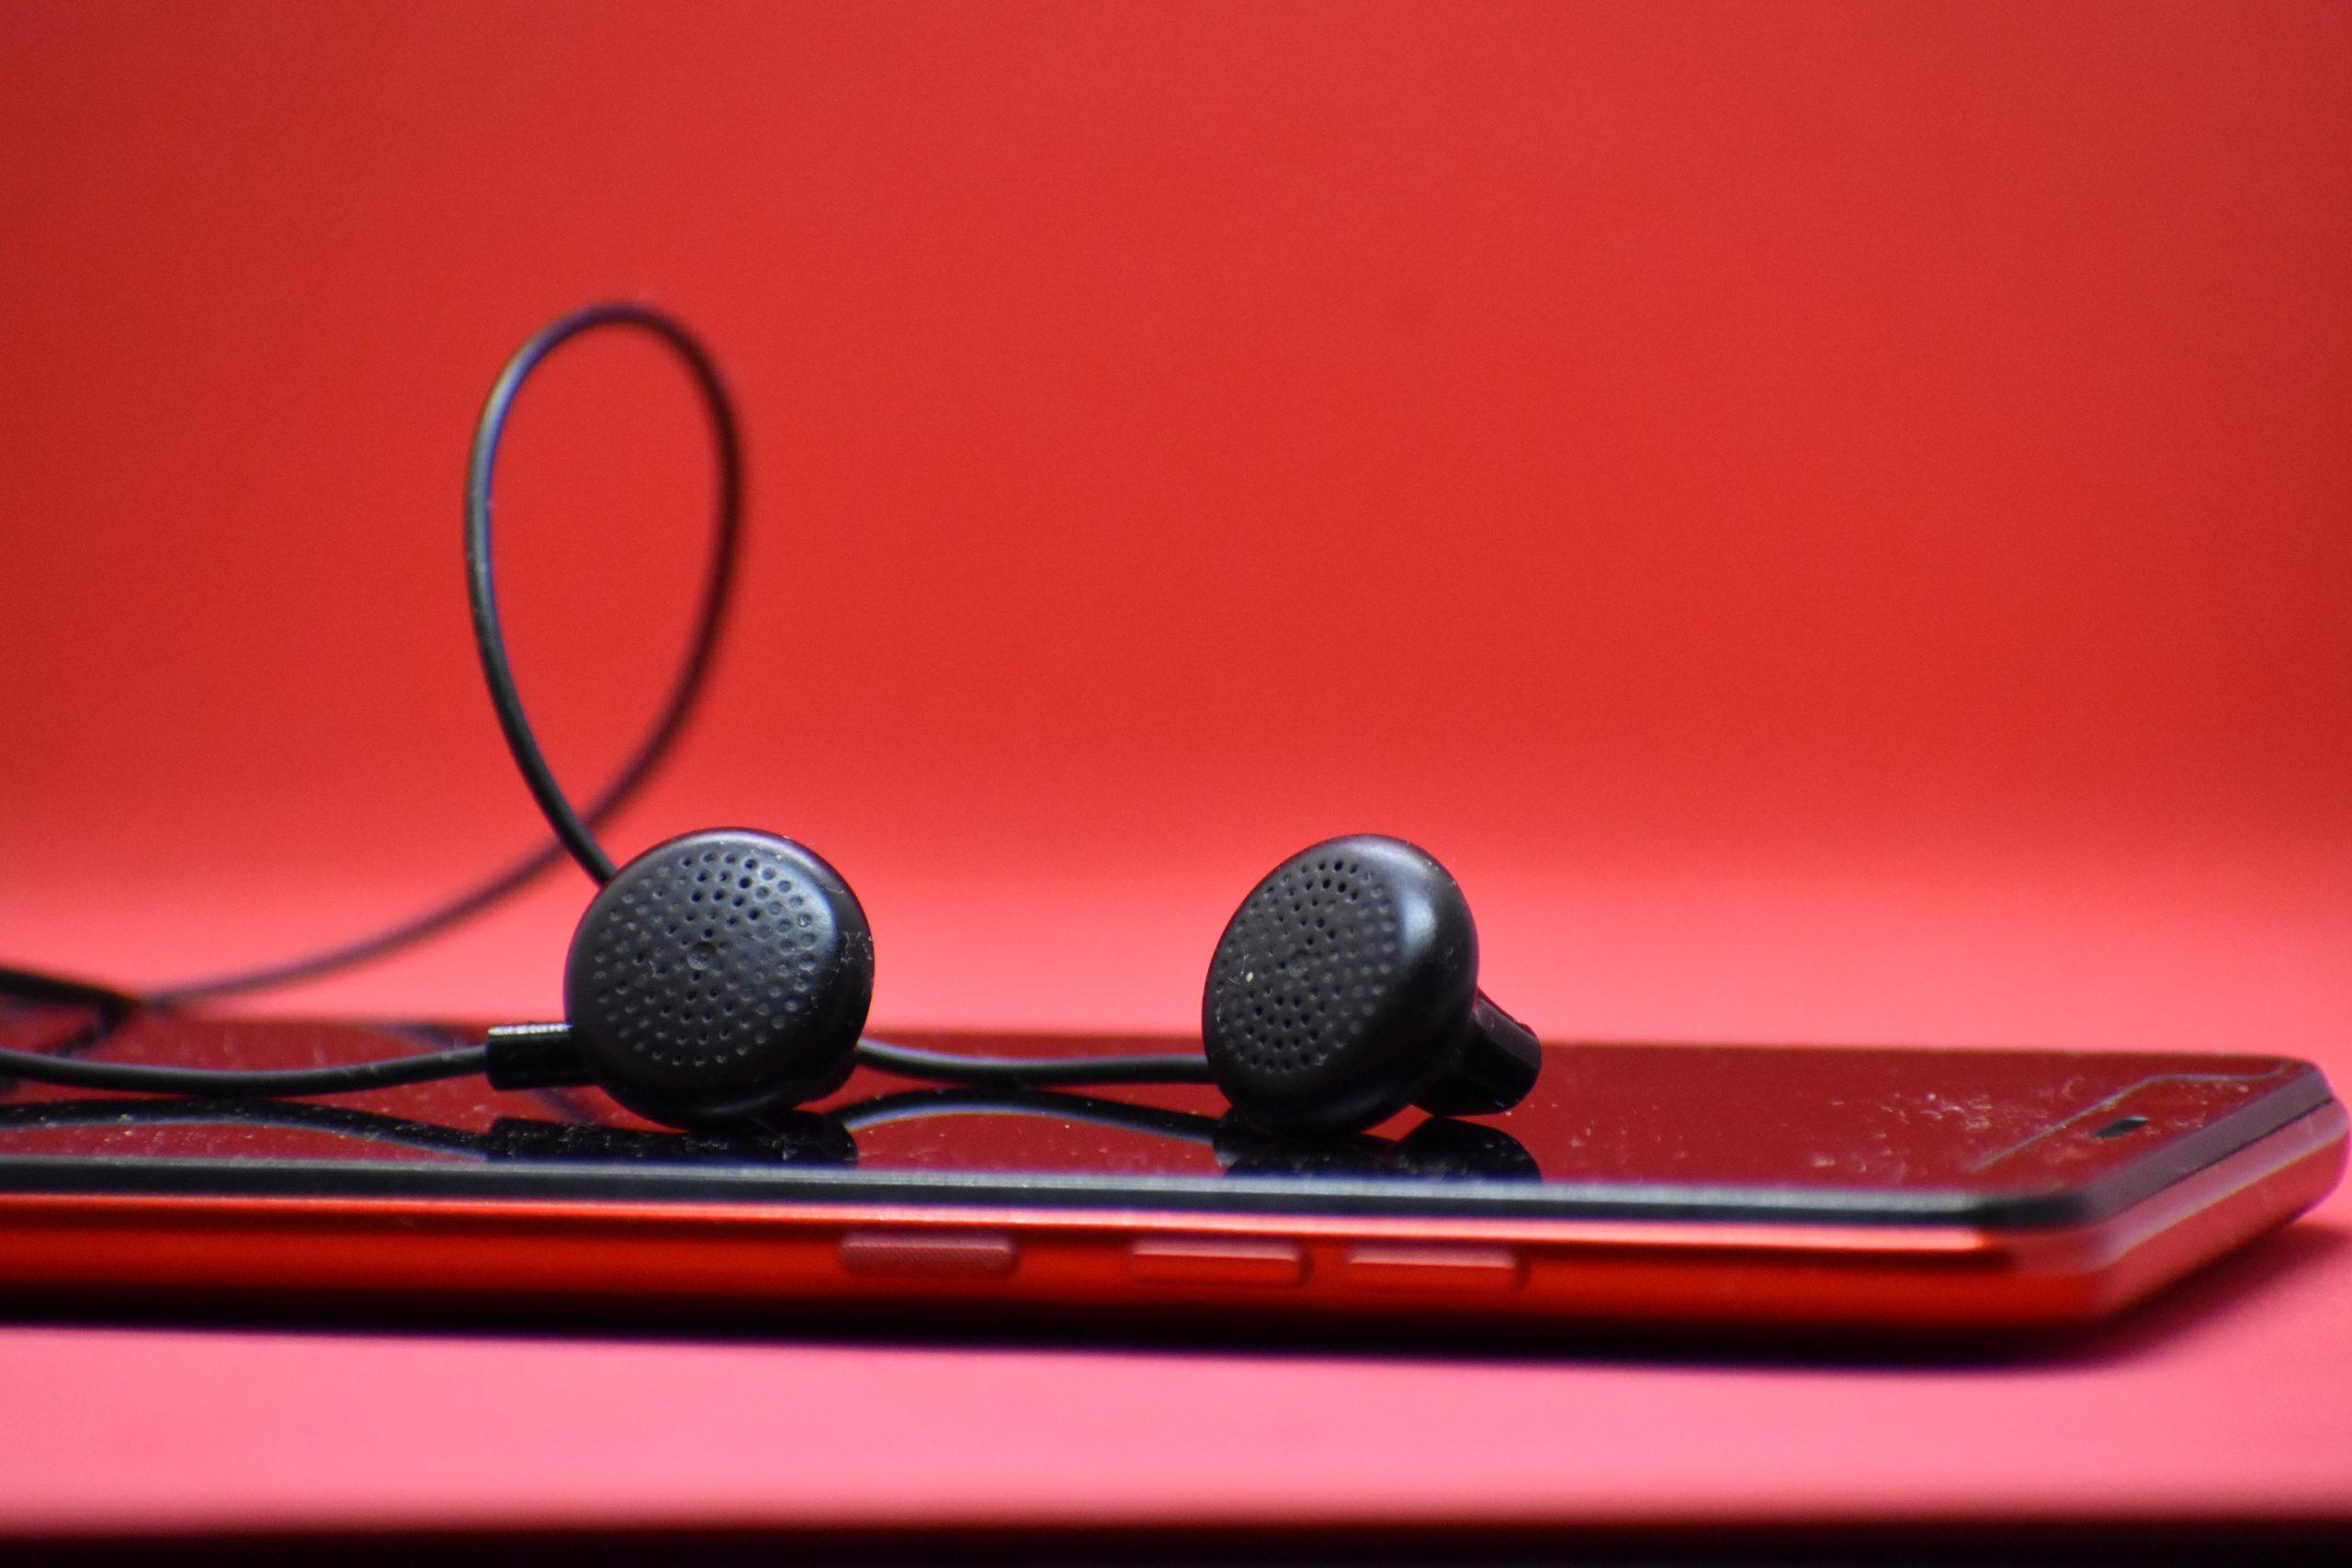 earphones and mobile